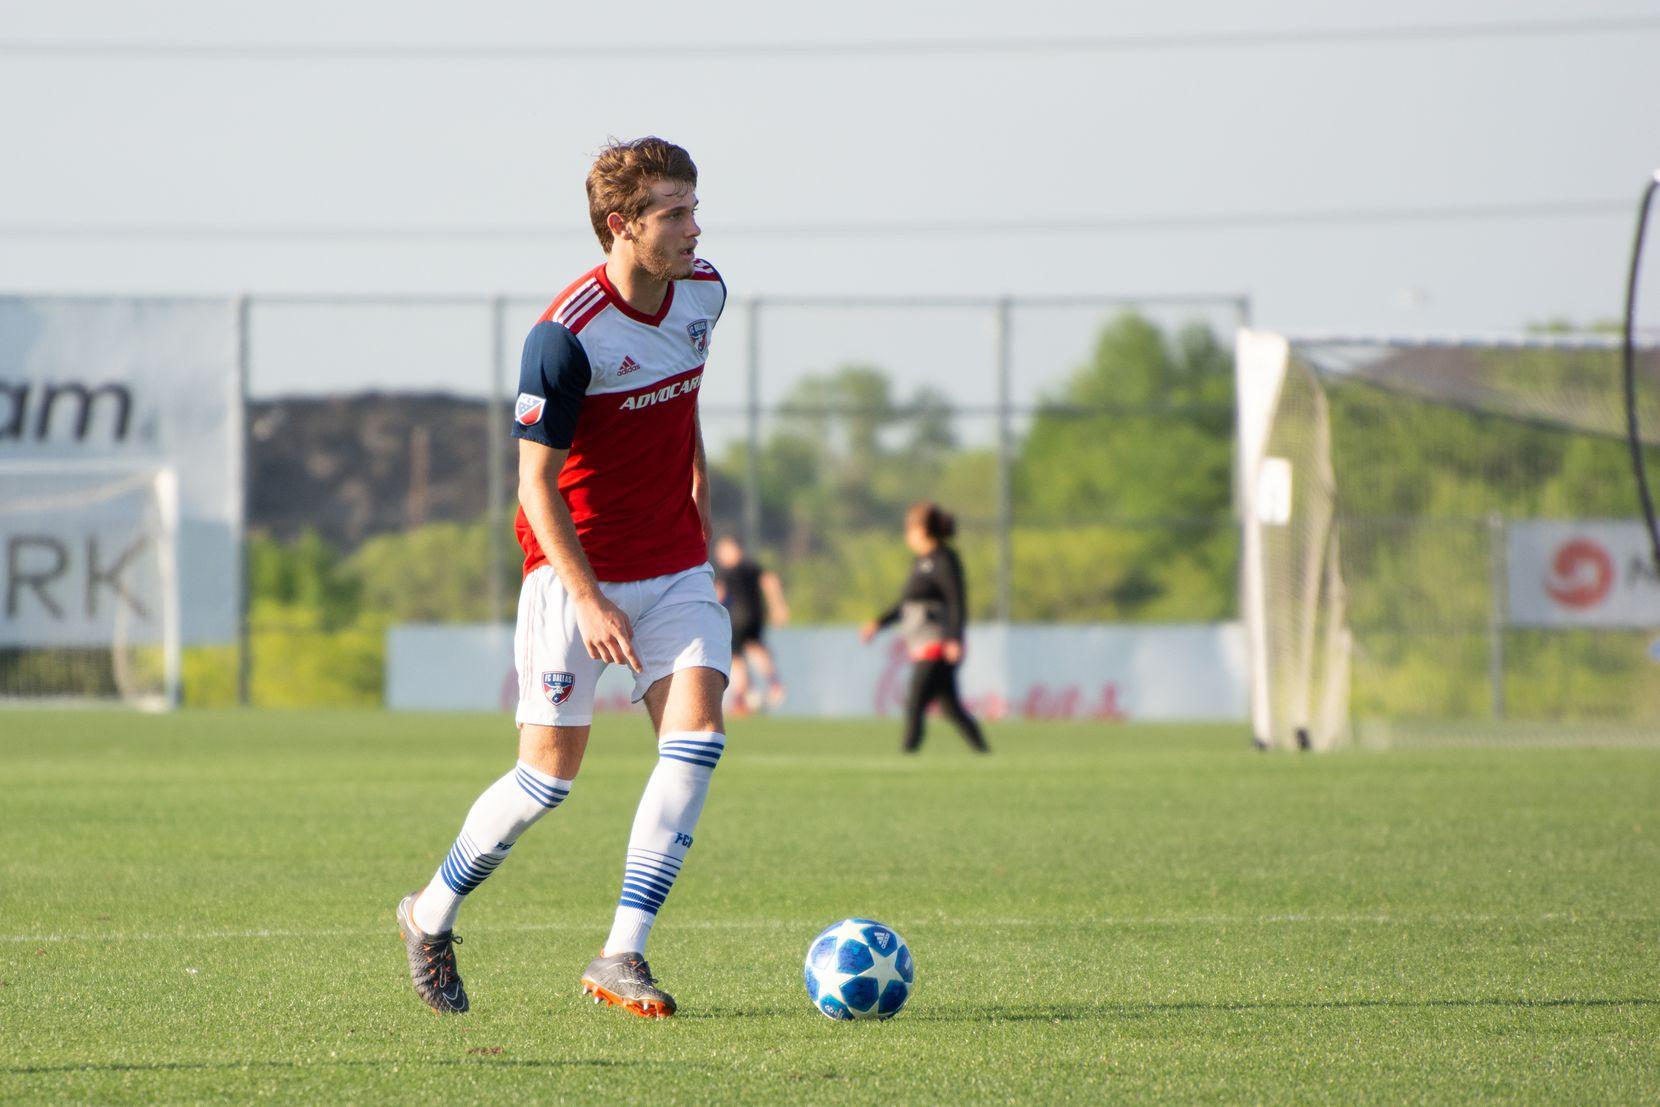 Tanner Tessmann of FC Dallas surveys the field ahead against Queretaro in the 2019 Dallas Cup Super Group.